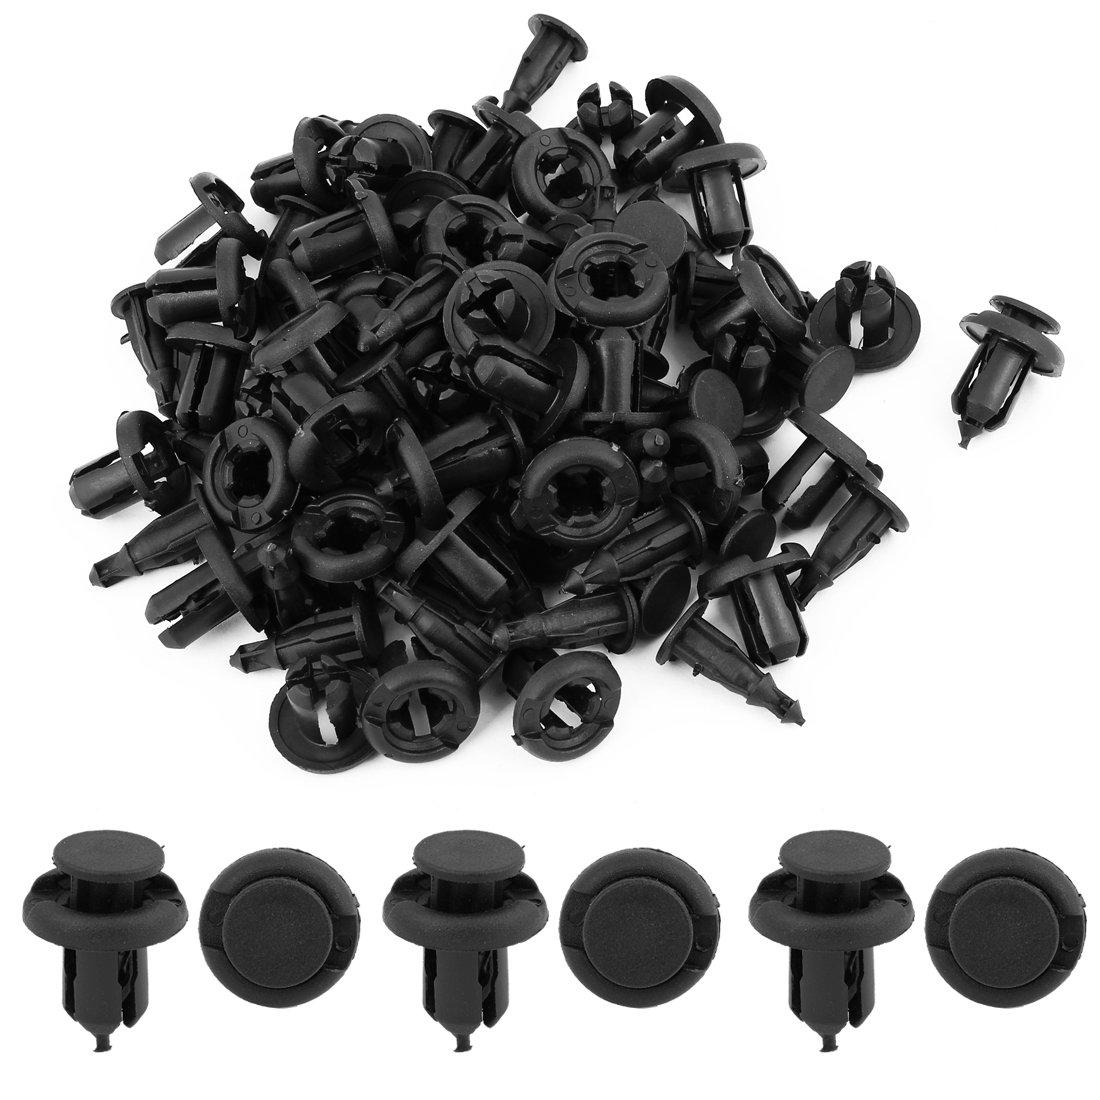 Sourcingmap 50Pcs Negro Remaches de Veh/ículo Puerta Panel Molduras 20mm Grapa 9mm Agujero